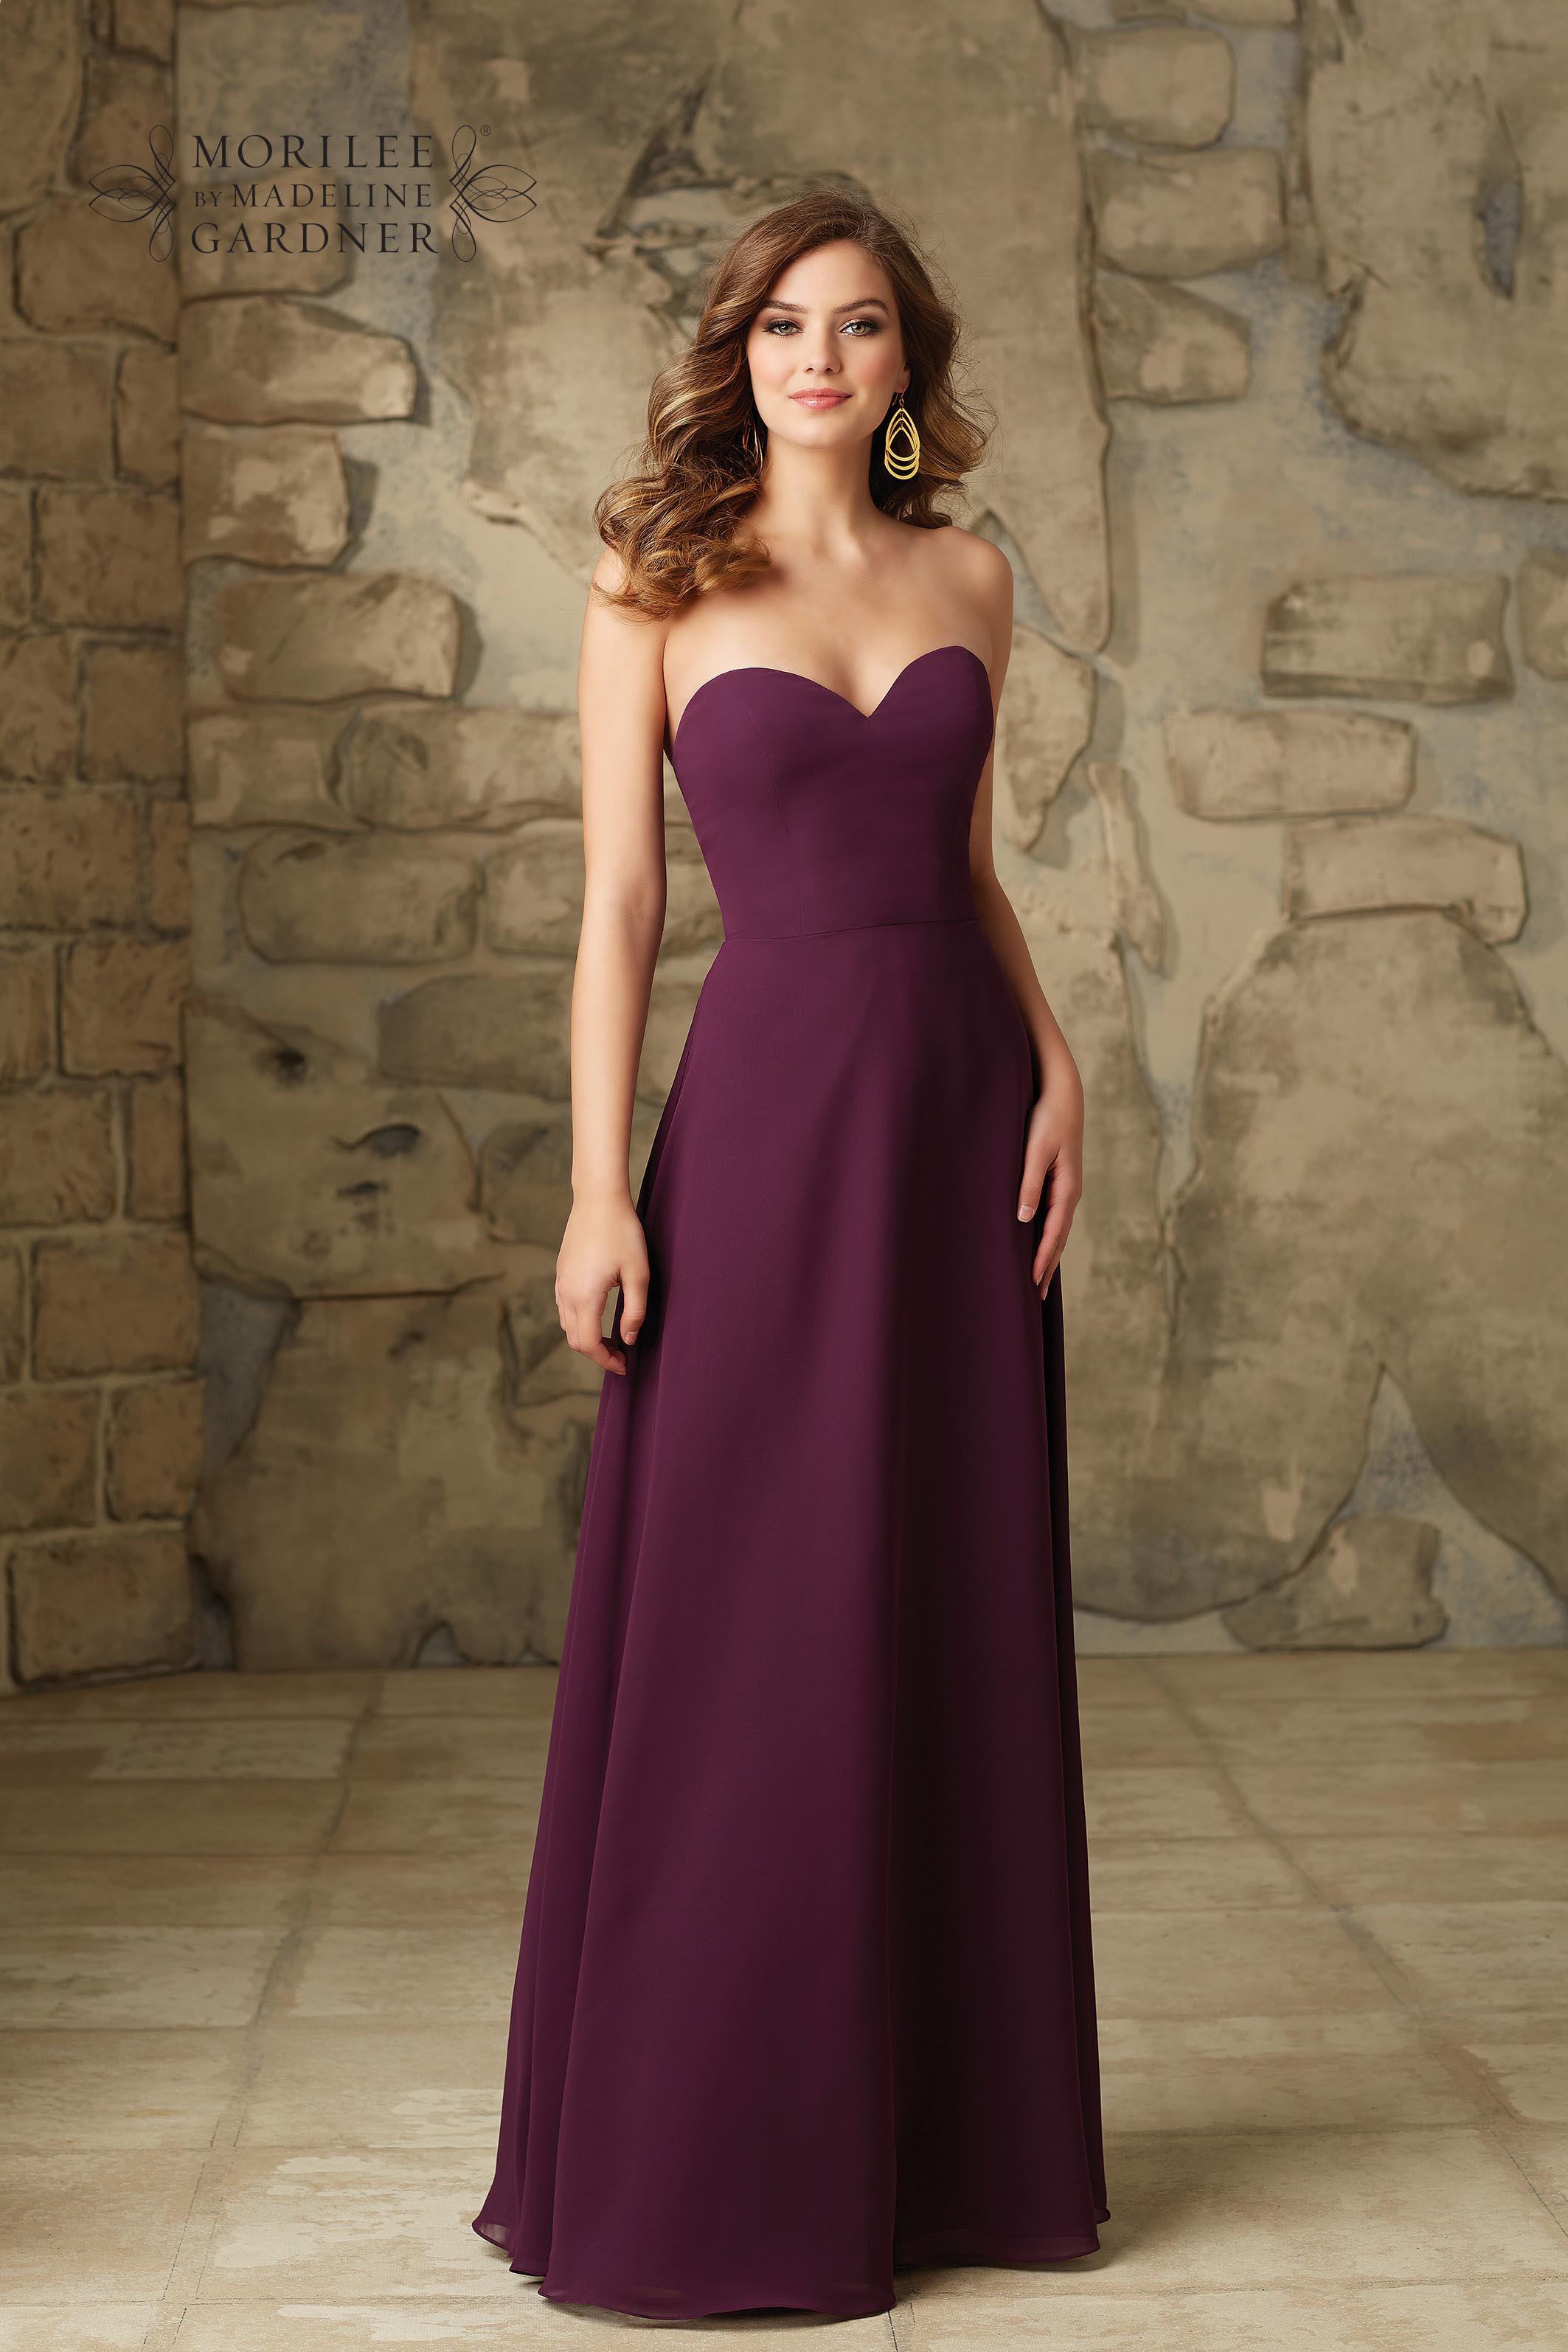 Mori Lee Bridesmaid Dress 101 Catrinas Bridal